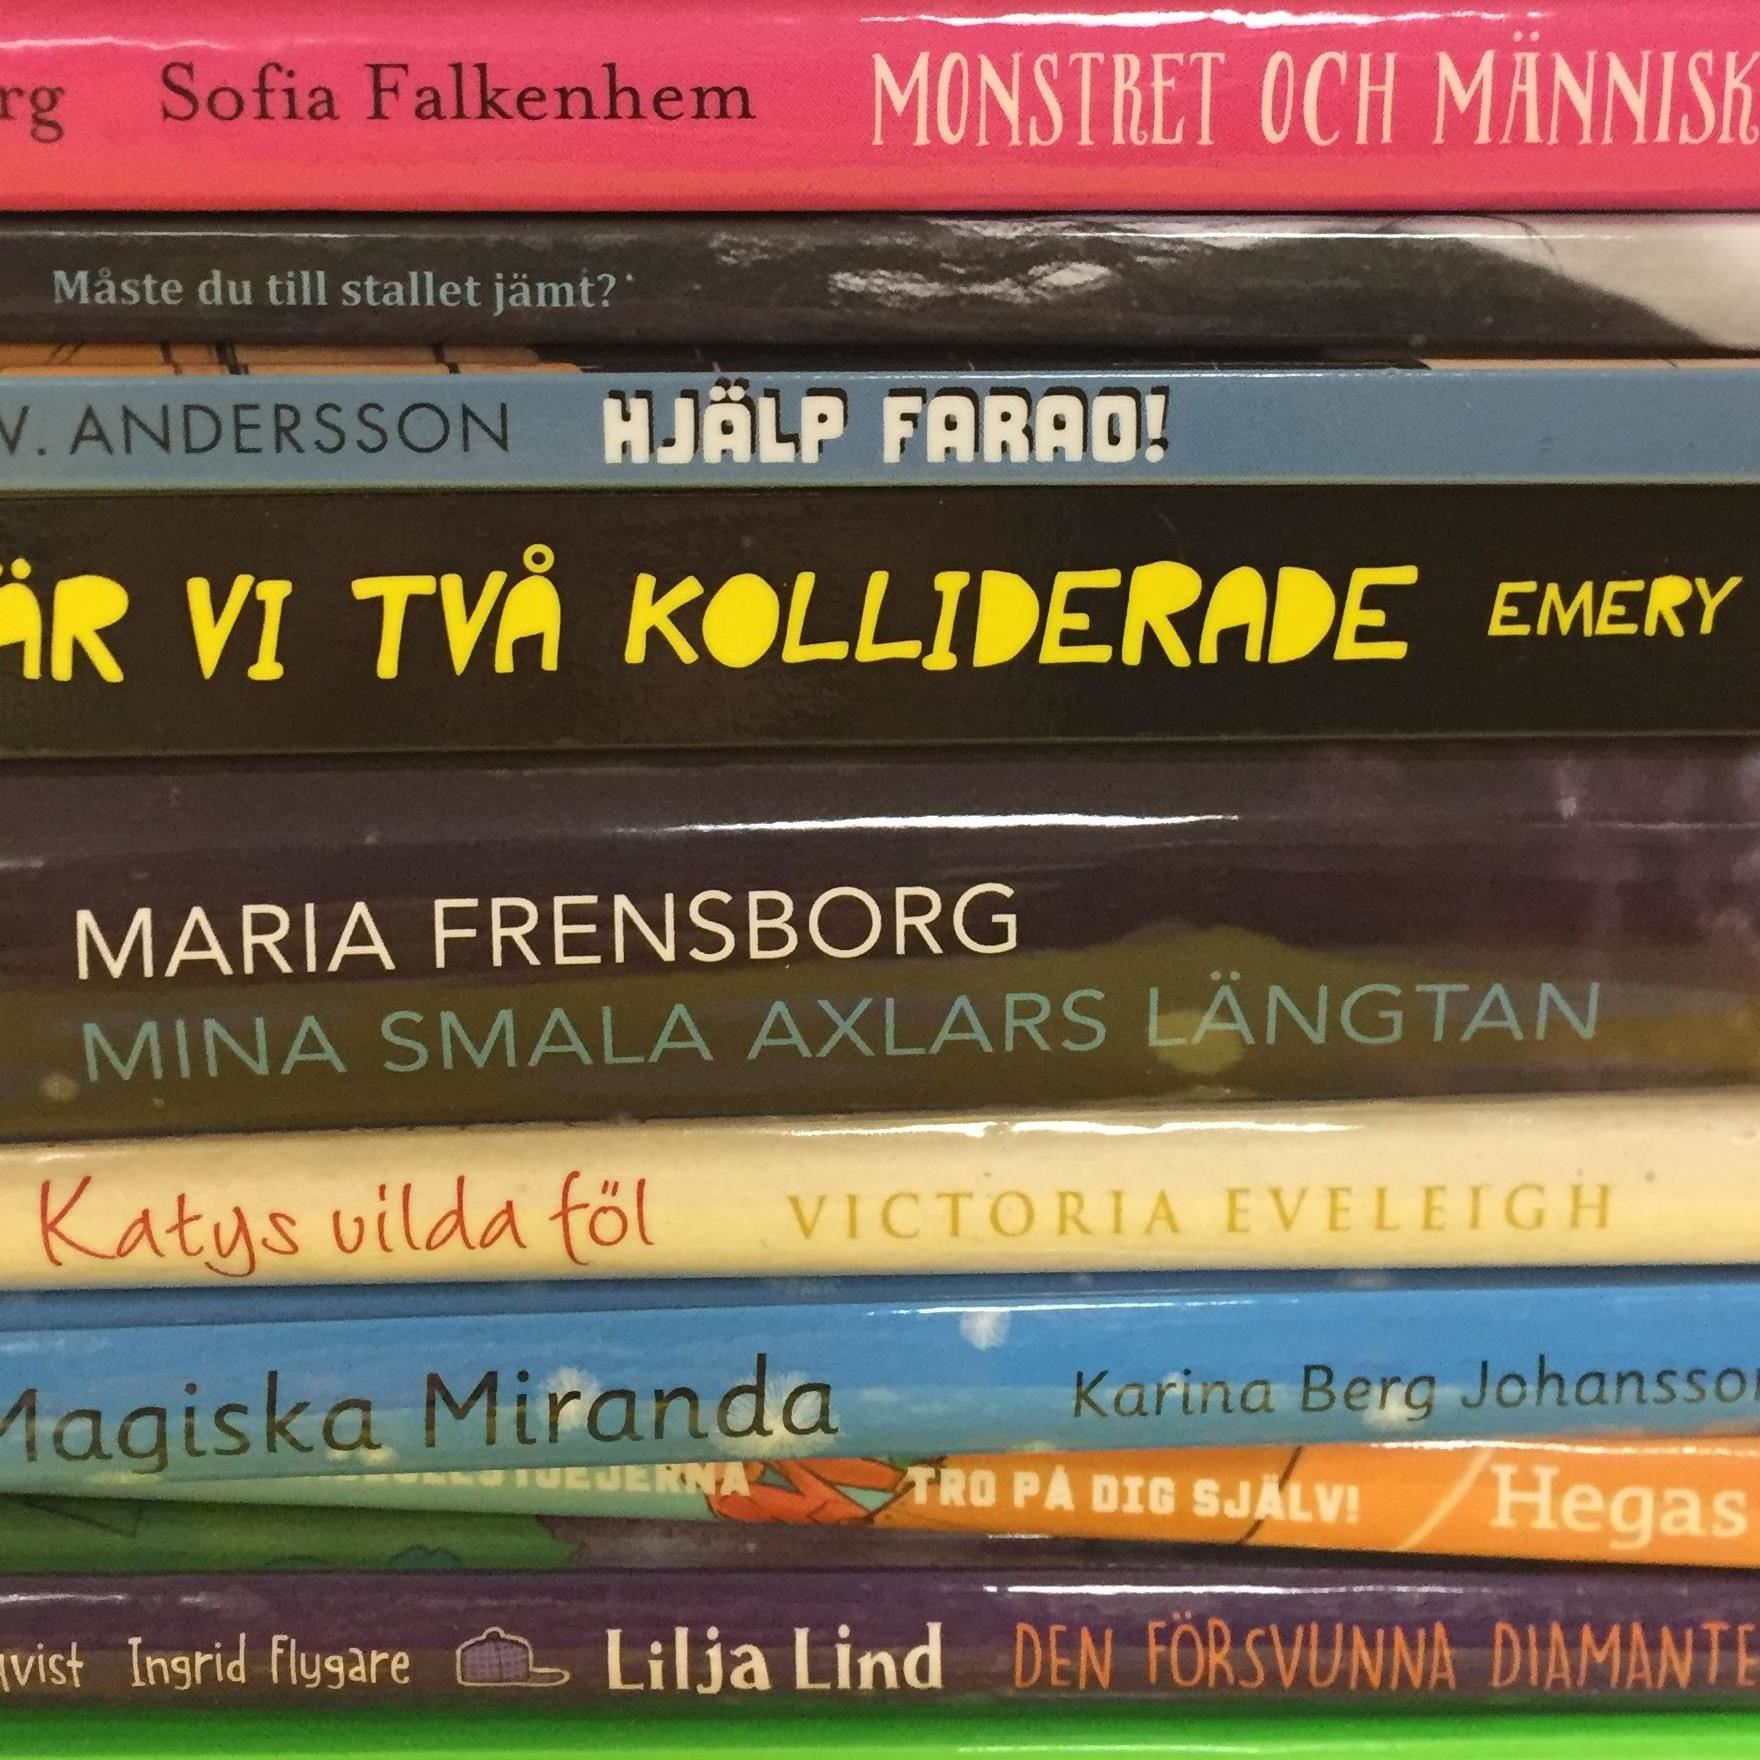 Åsa Liliefeldt, Böcker